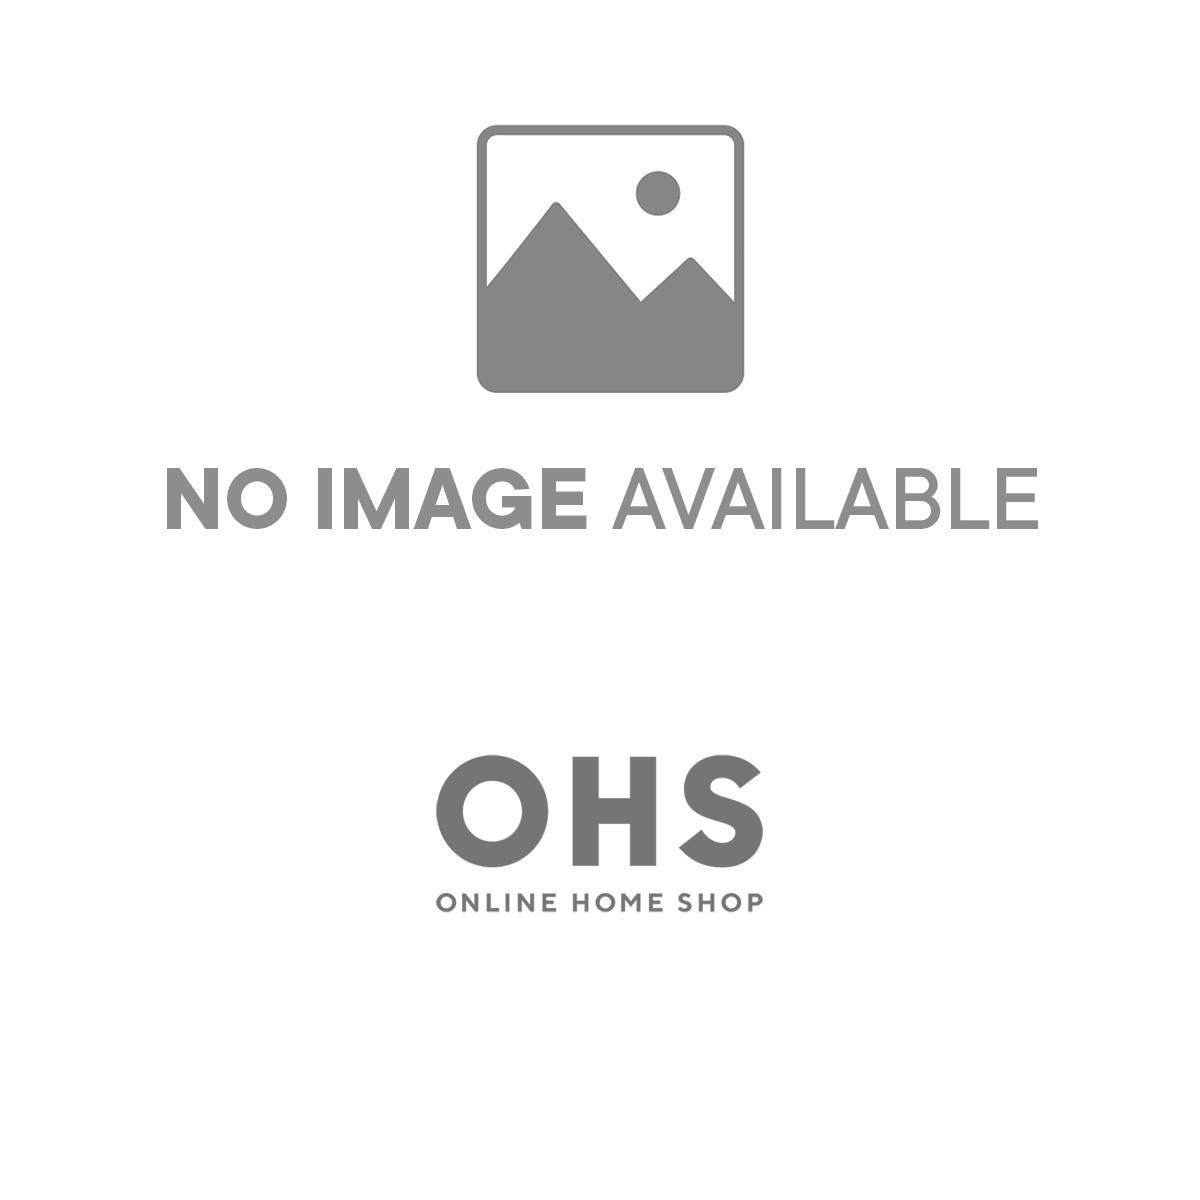 Union Jack Skyline Duvet Set - Charcoal